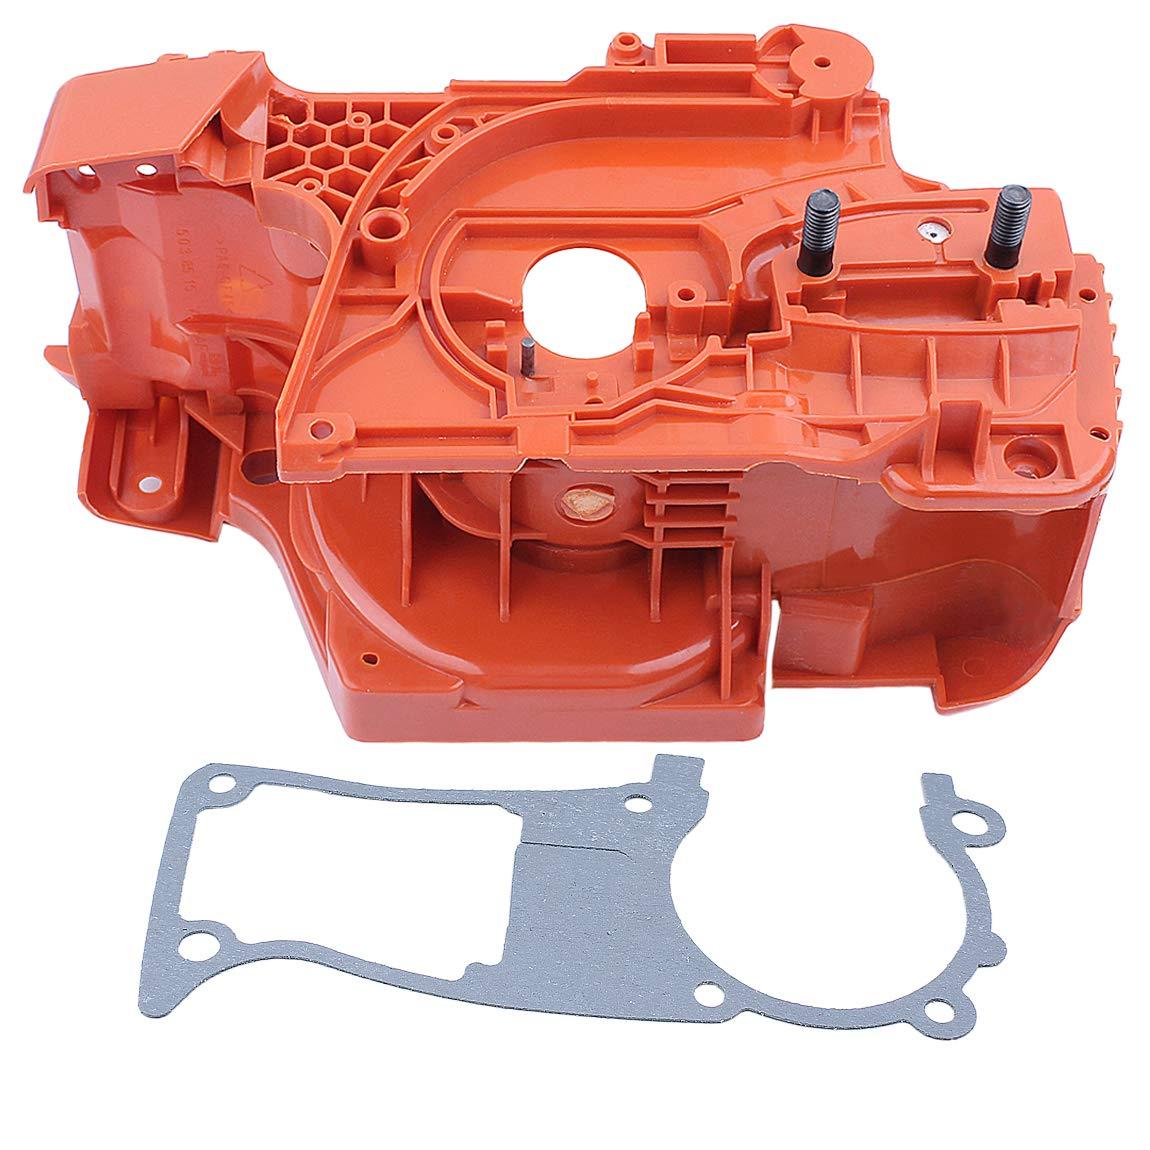 Haishine Engine Crankcase Crank Case w/Gasket for Husqvarna 350 345 340  Chainsaw Motor Parts #537172001